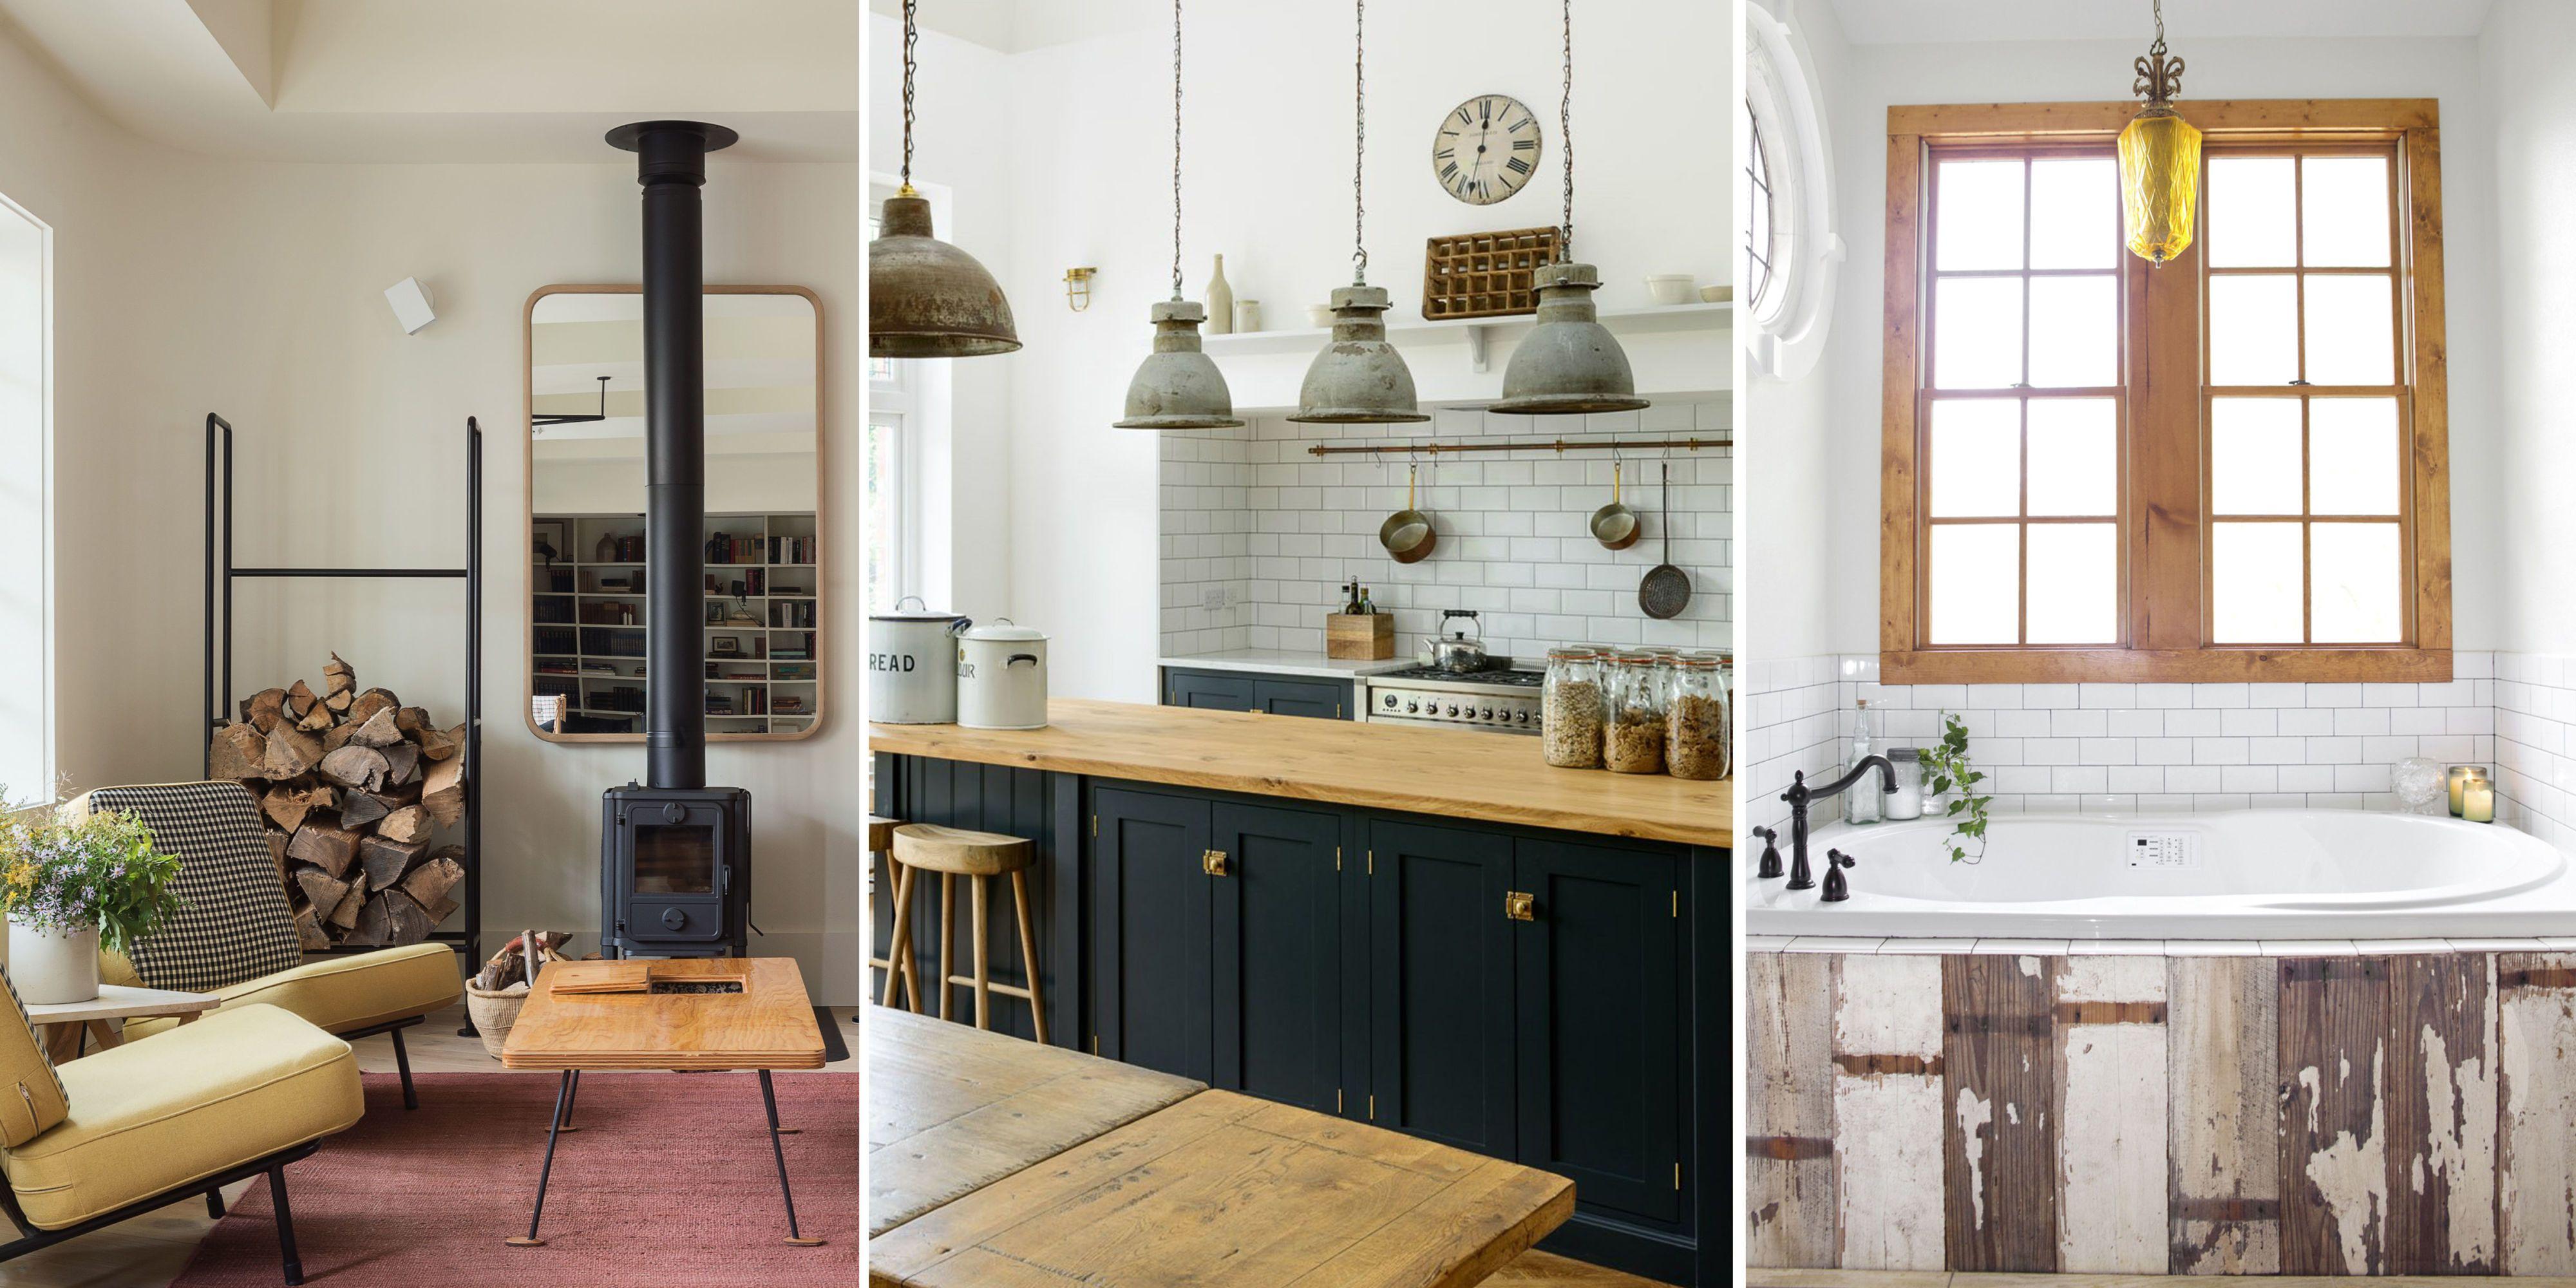 Matthew Williams/deVOL Kitchens/Touchstone & 10 Modern Rustic Decor Ideas - These Modern Rustic Rooms Prove You ...